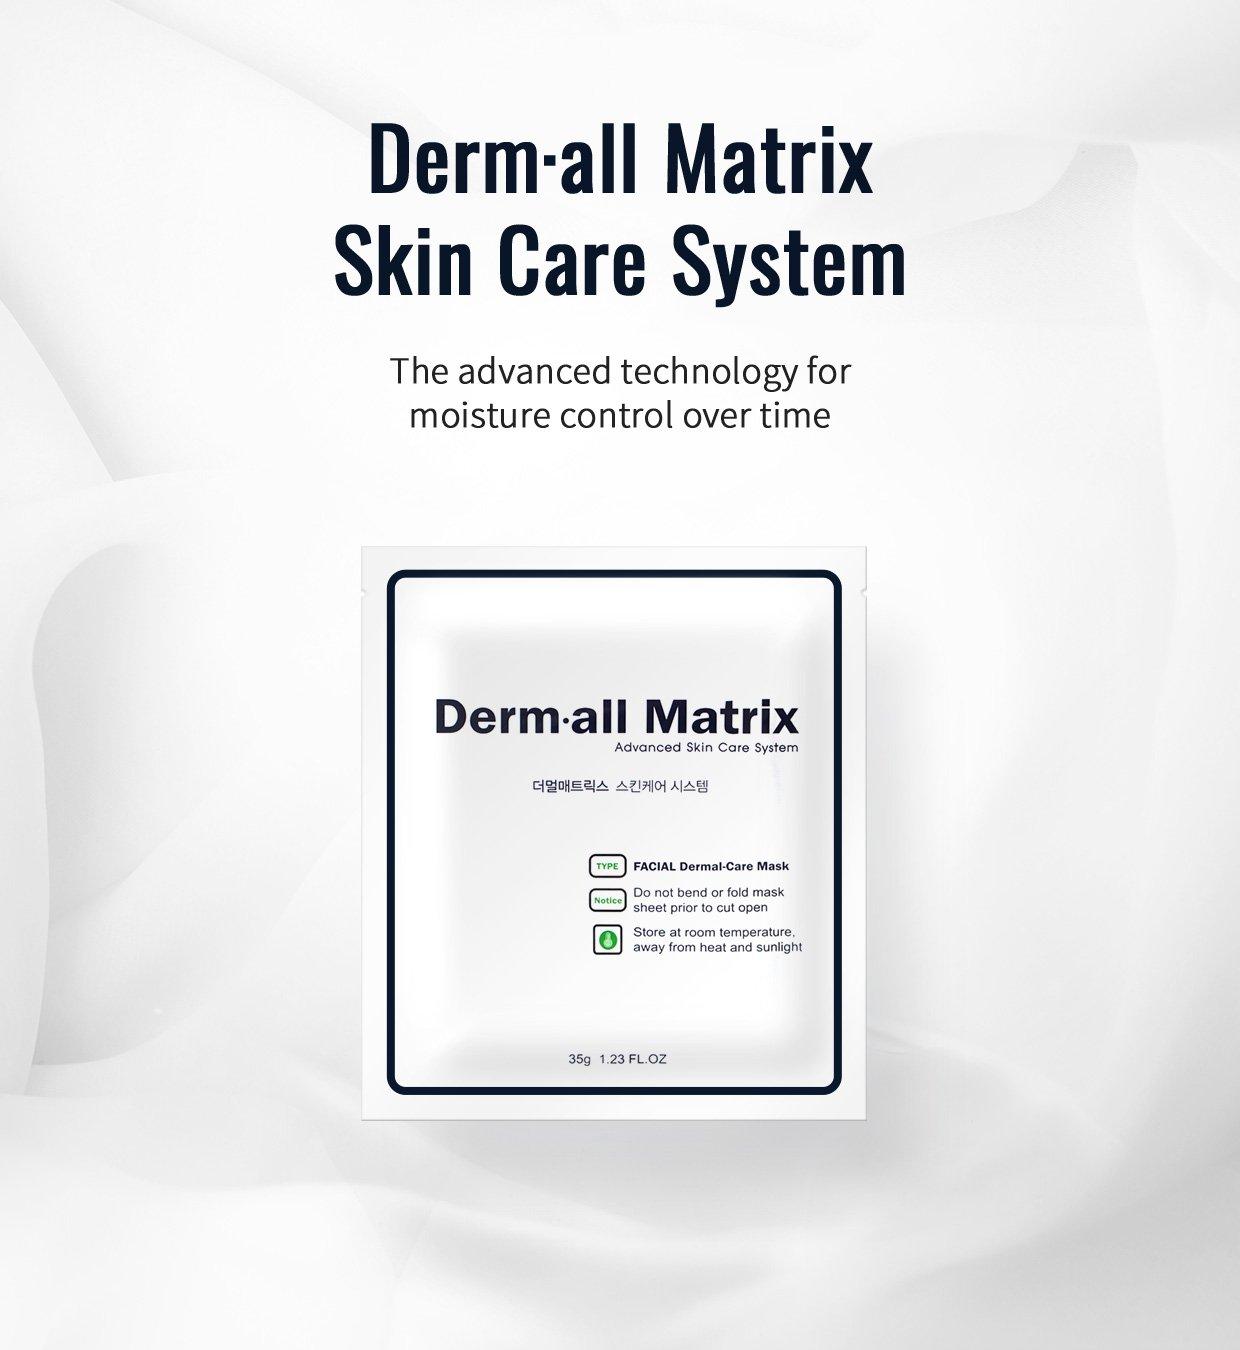 Dermall Matrix Daily Facial Dermal Care160g 4ea Secret Key Nature Recipe Mask Pack Tea Tree 20g 3pcs Beauty